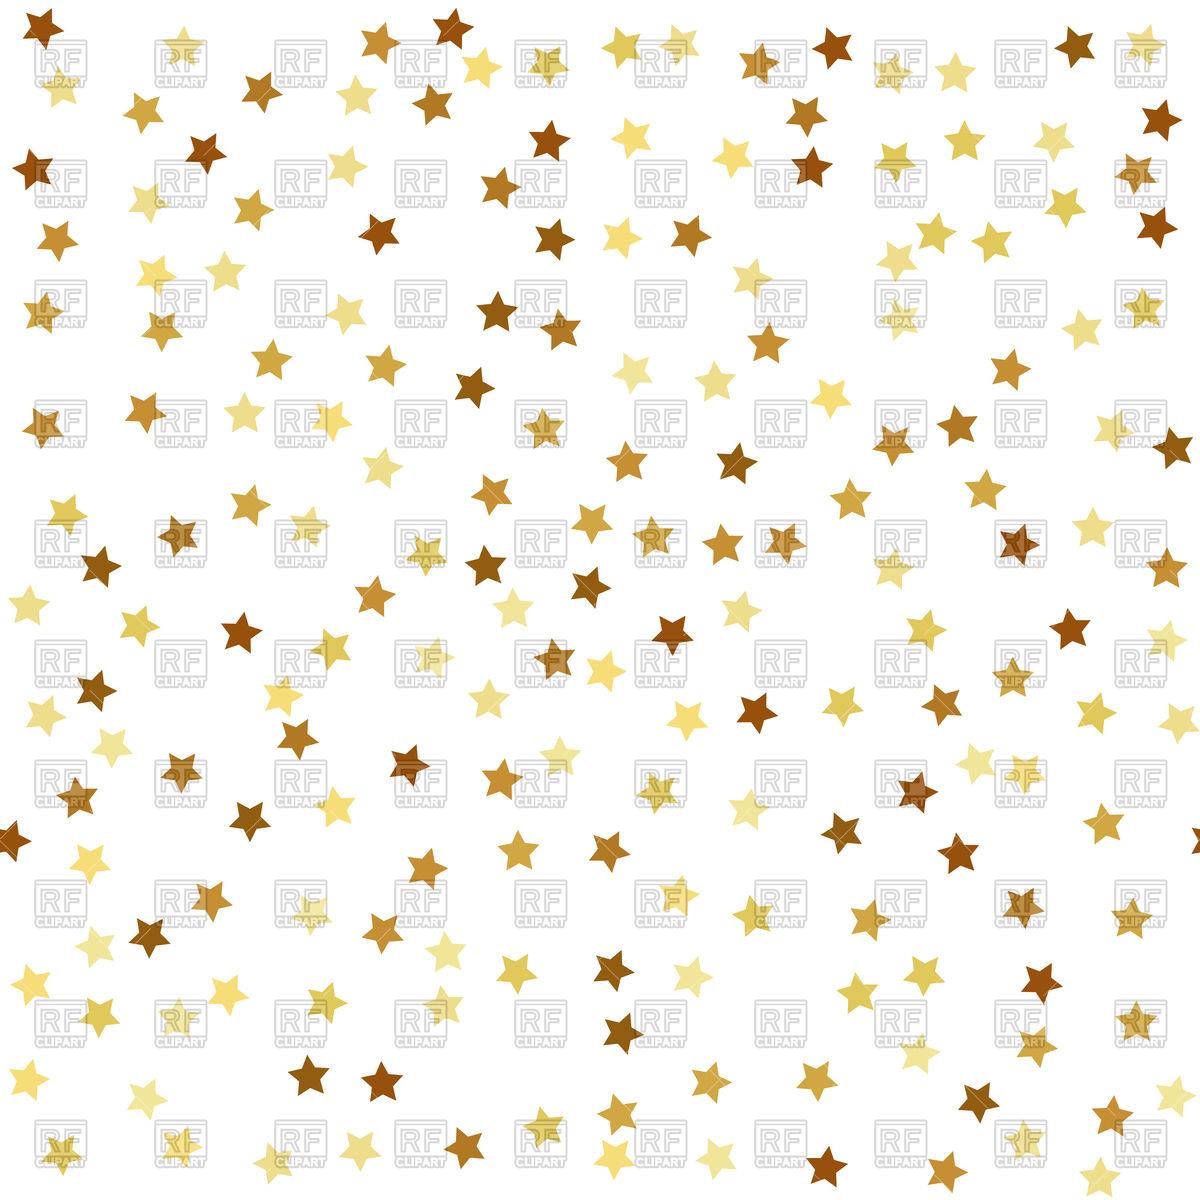 Black And White Polka Dot Wallpaper Border Free Star Pattern Cliparts Download Free Clip Art Free